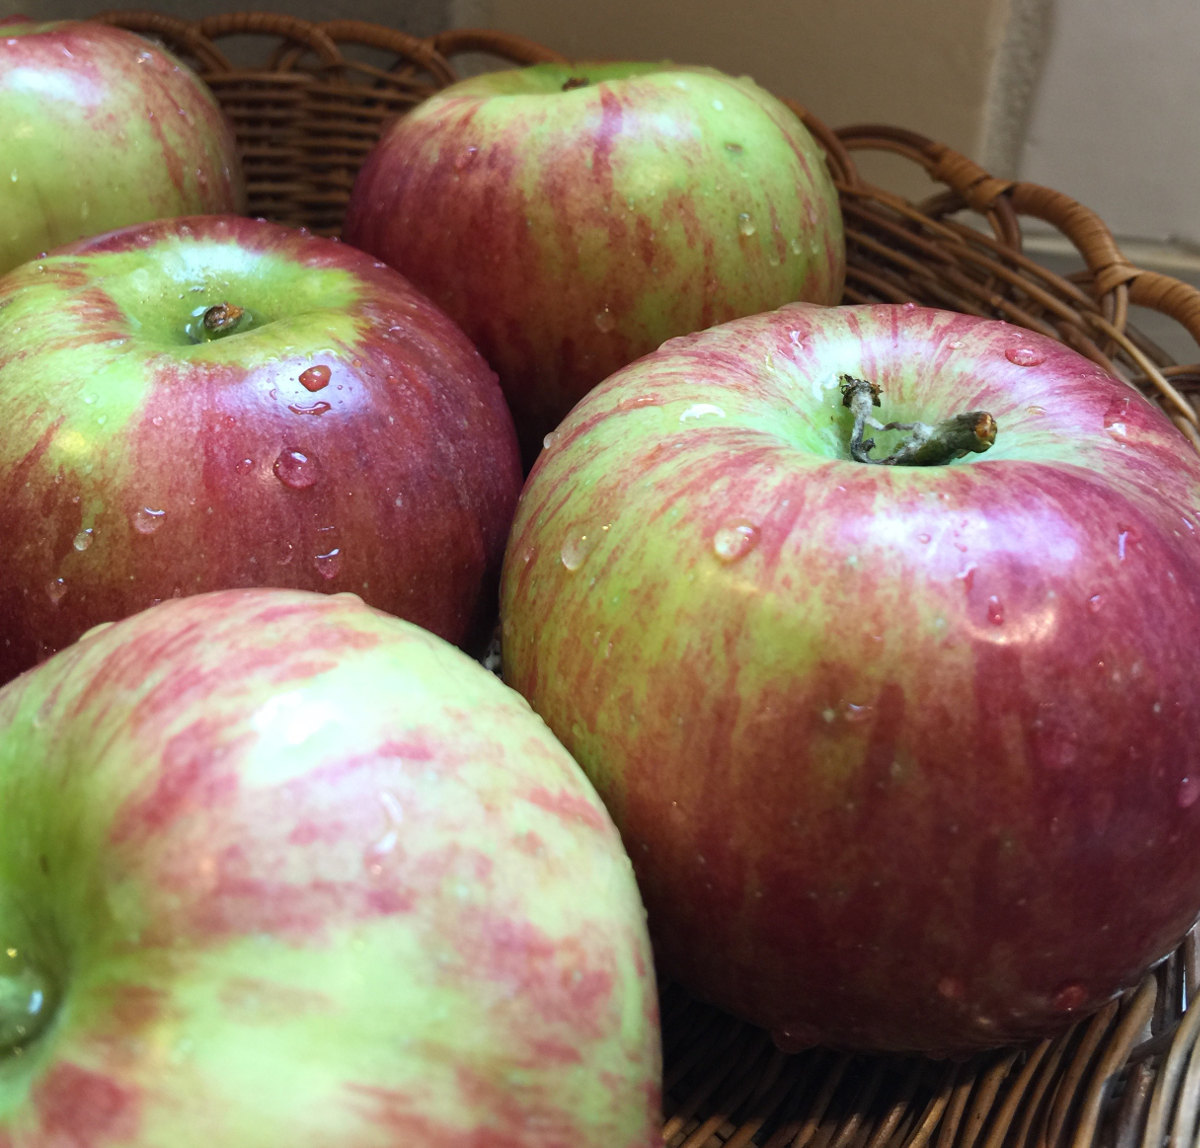 apple maple cobbler - medium size Cortland apples, good for cooking - Atticmag.com